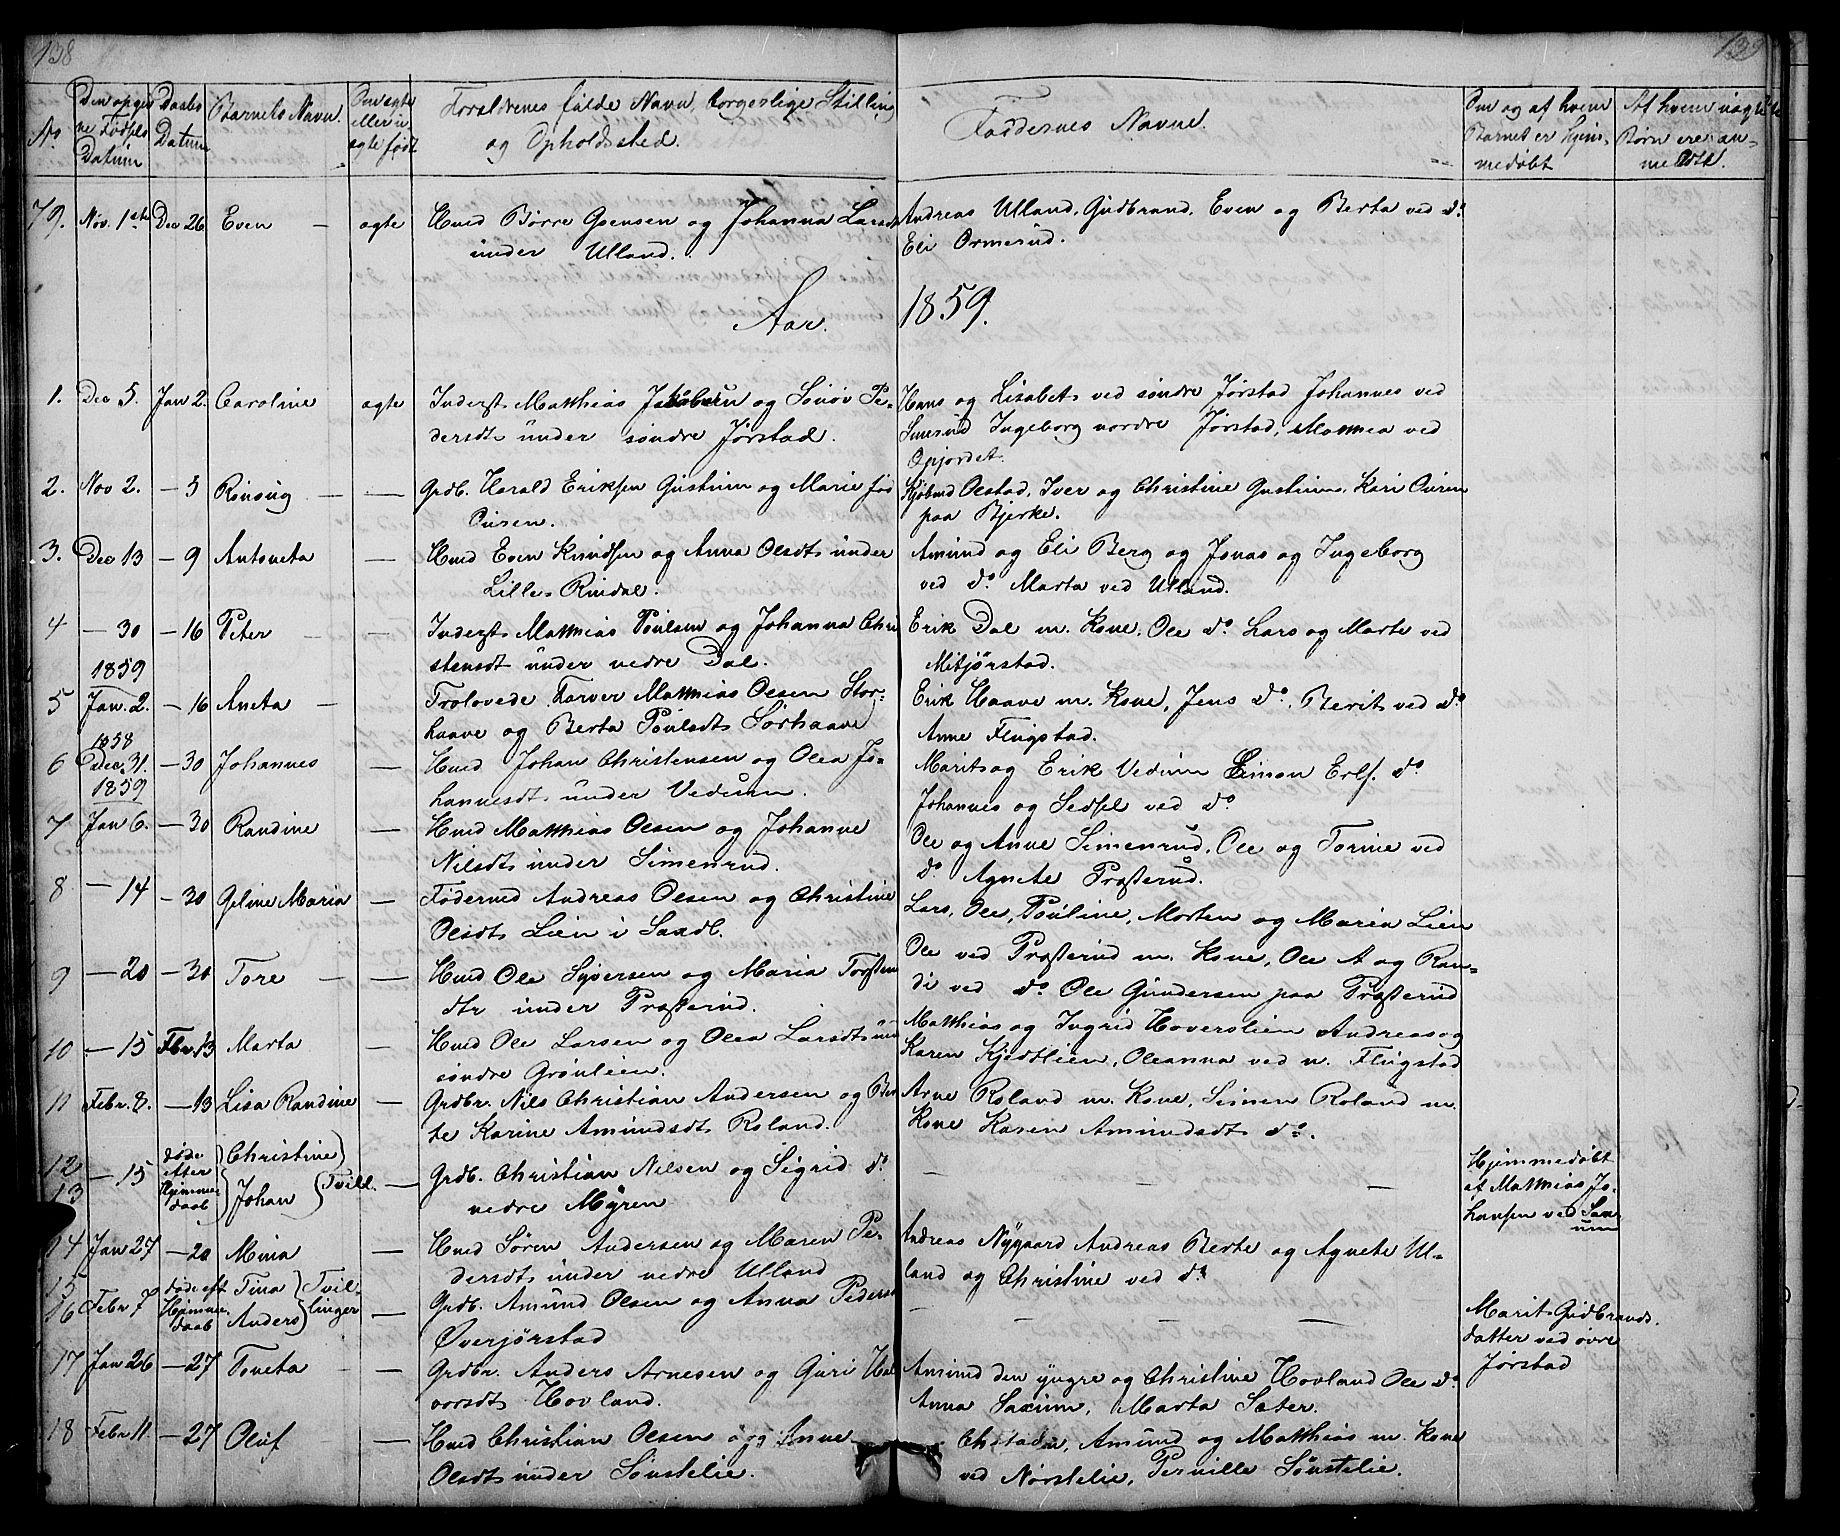 SAH, Fåberg prestekontor, Klokkerbok nr. 5, 1837-1864, s. 138-139